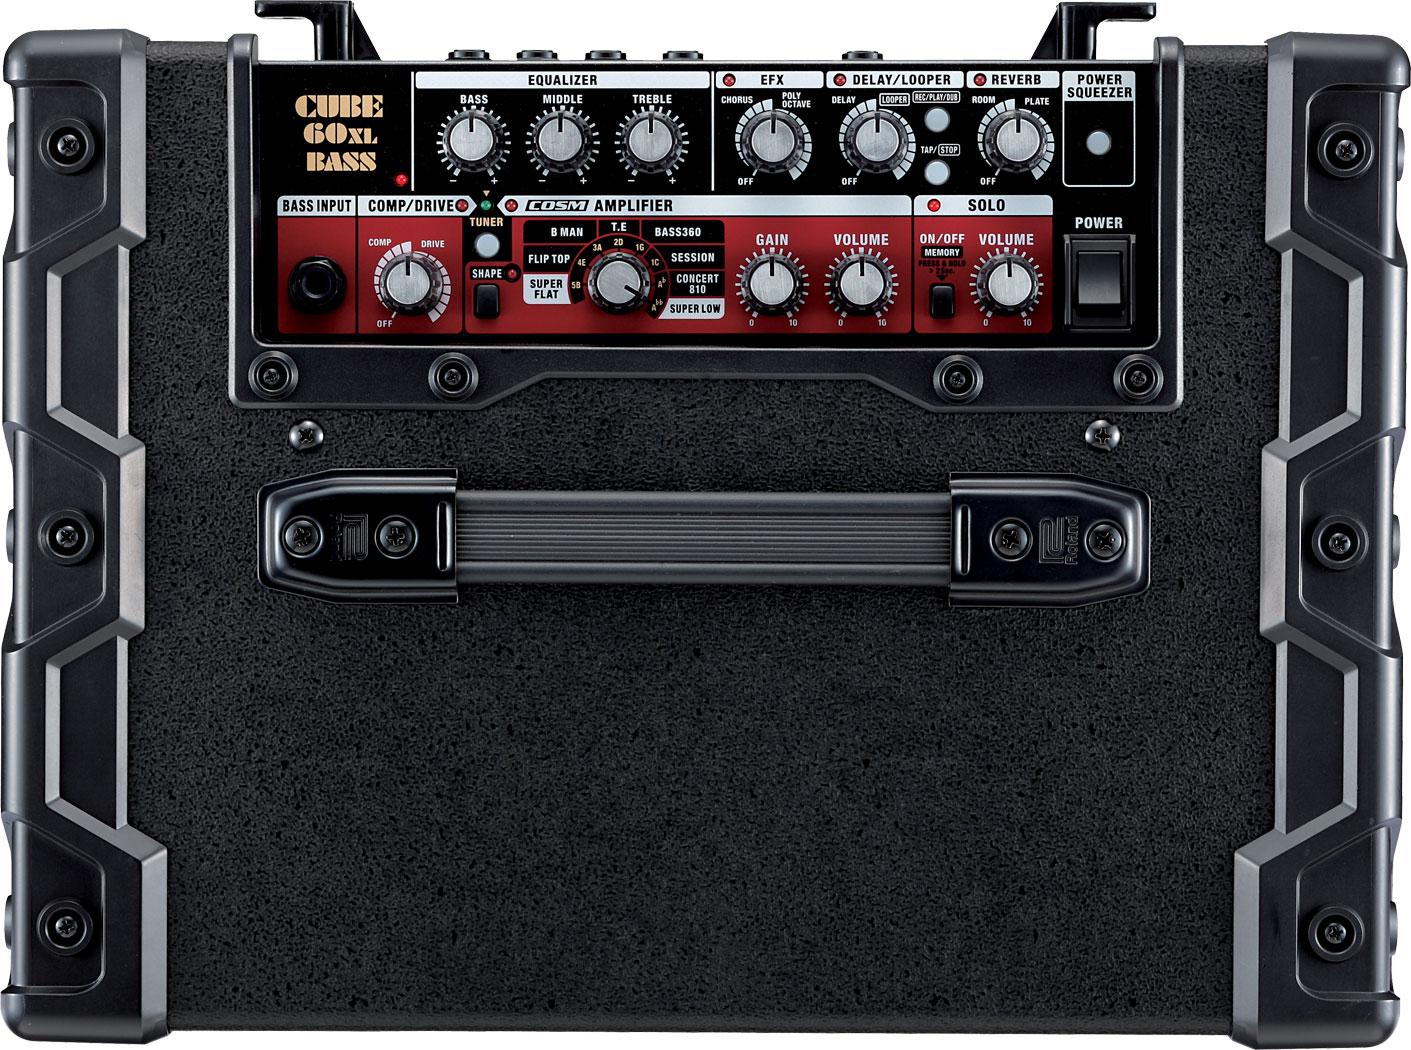 loa Roland Cube bass 60XL